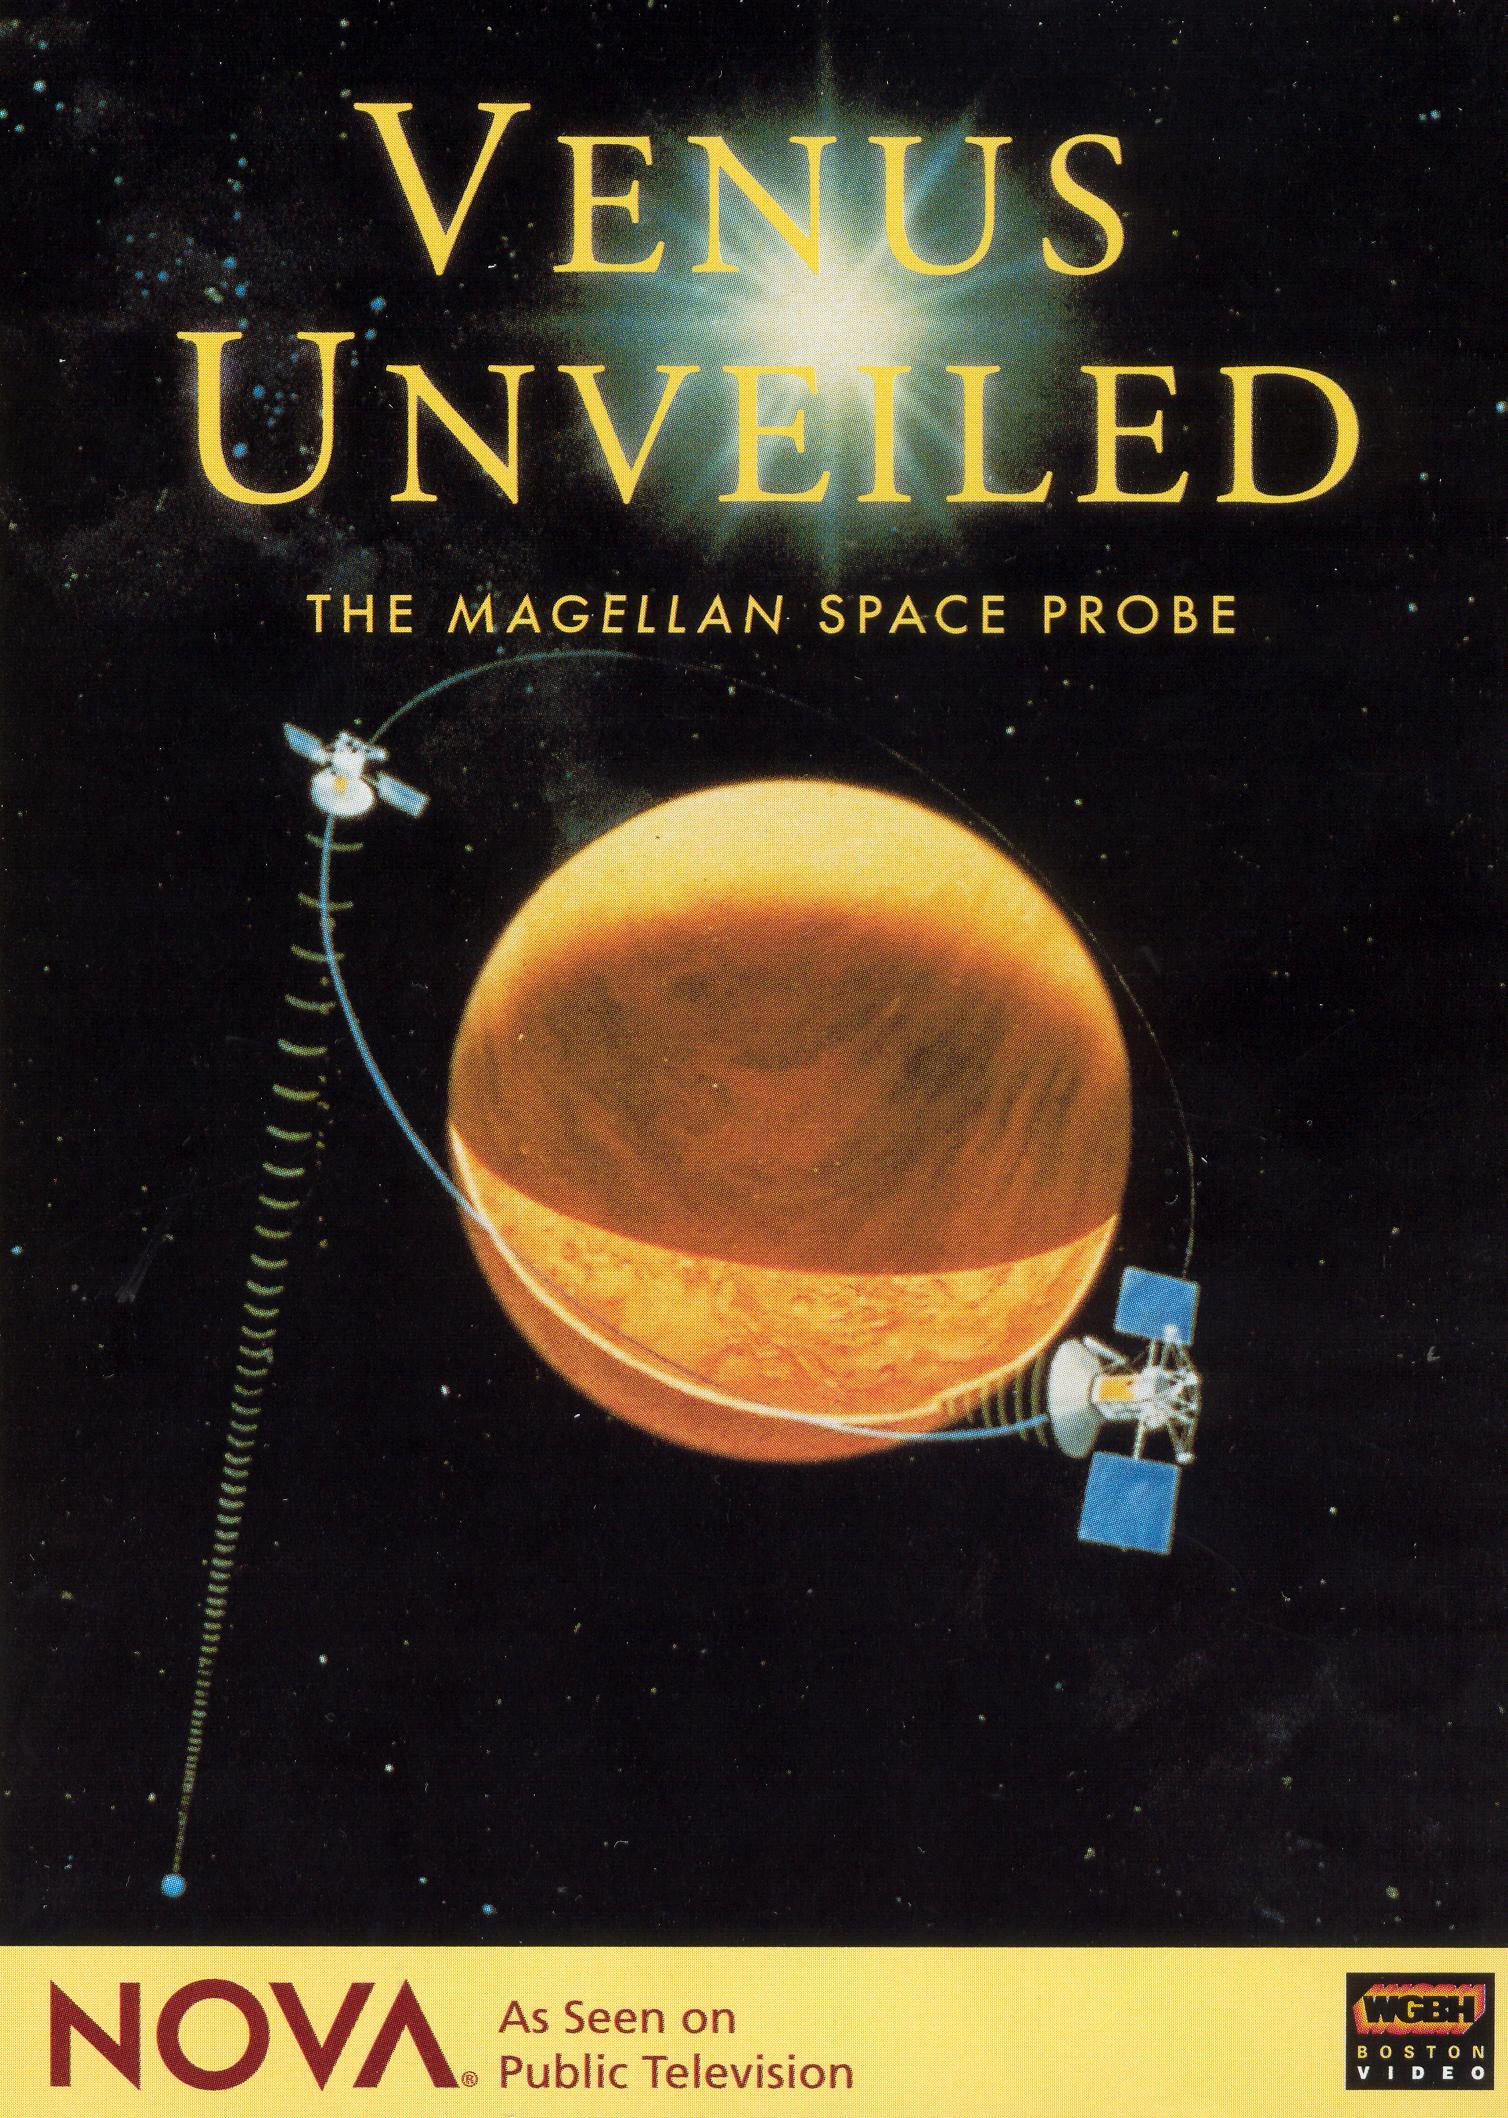 NOVA: Venus Unveiled - The Magellan Space Probe